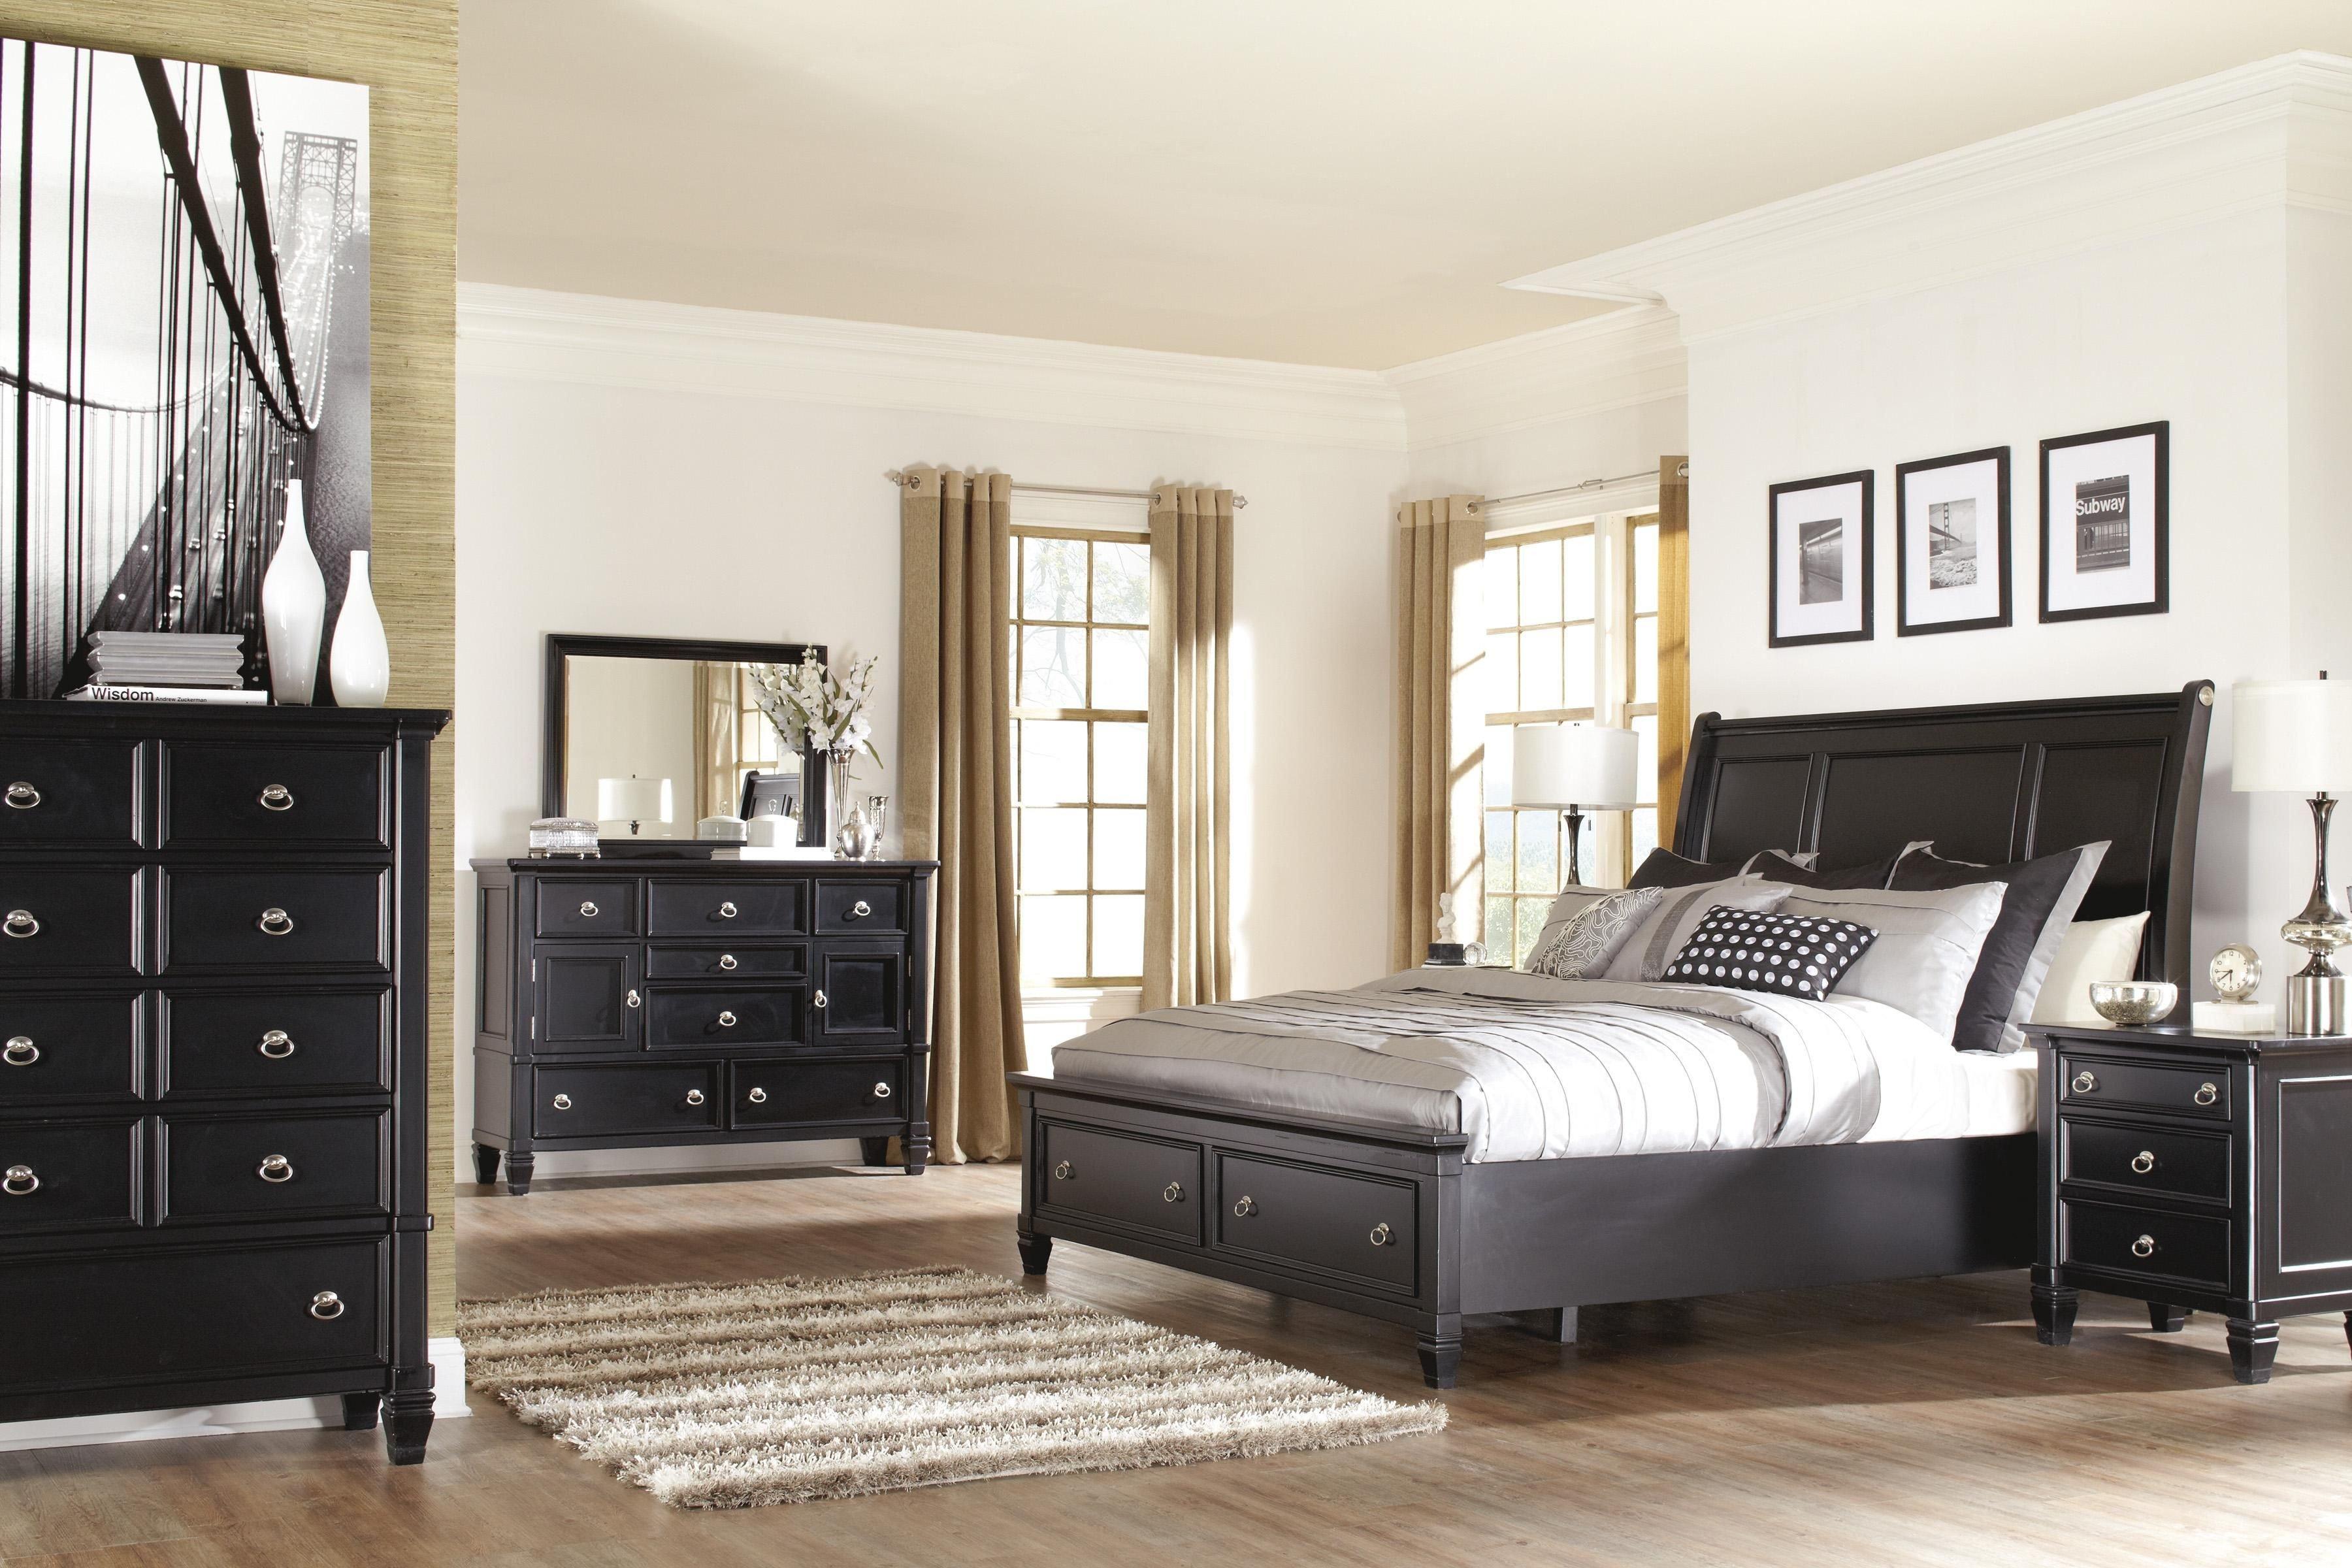 Bedroom Set with Storage Beautiful Millenium Greensburg